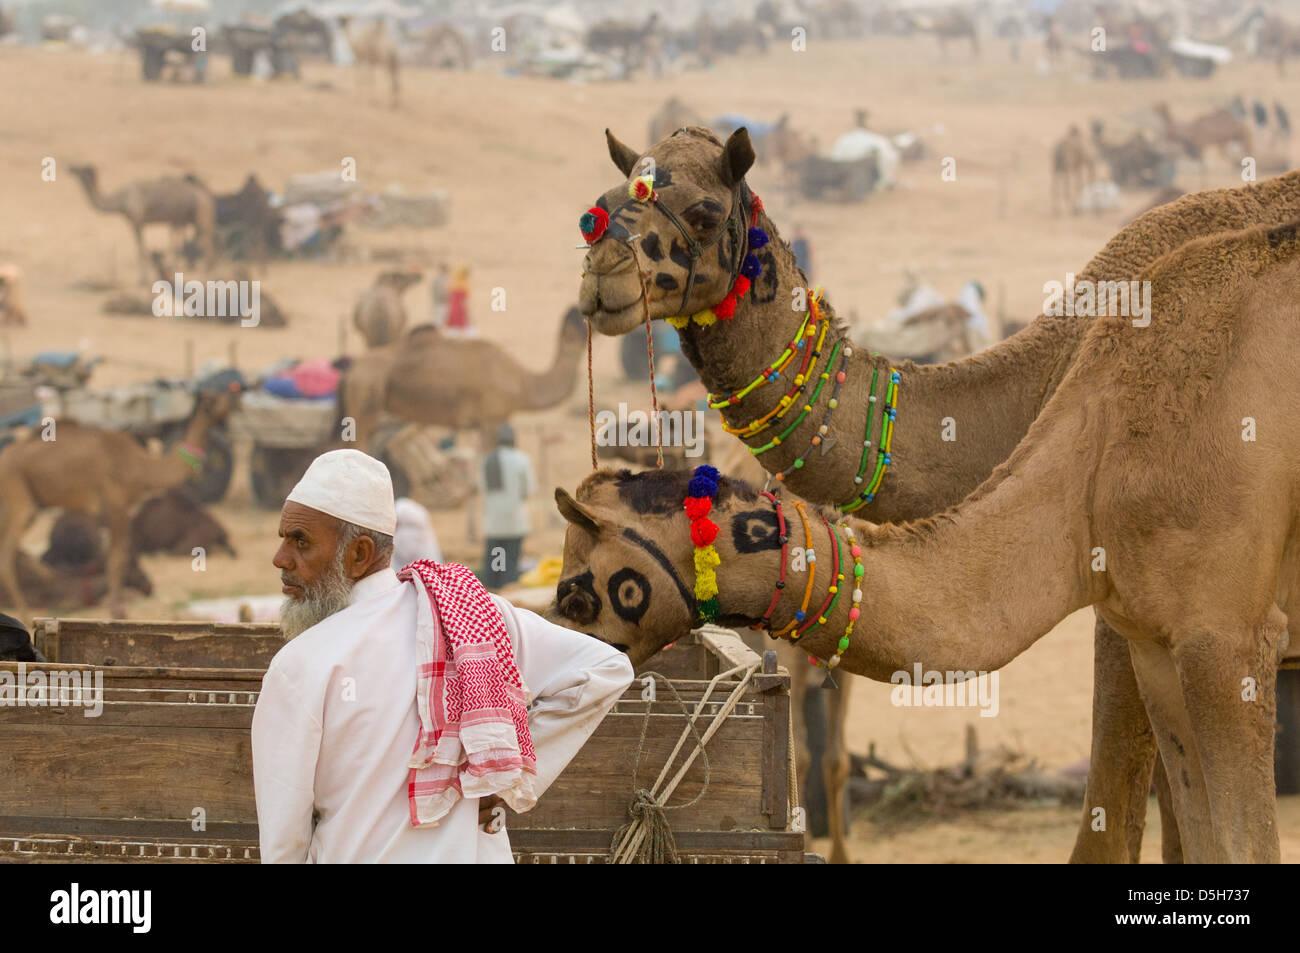 Muslim man feeding two decorated camels from a cart at the Pushkar Mela, Pushkar, Rajasthan, India - Stock Image